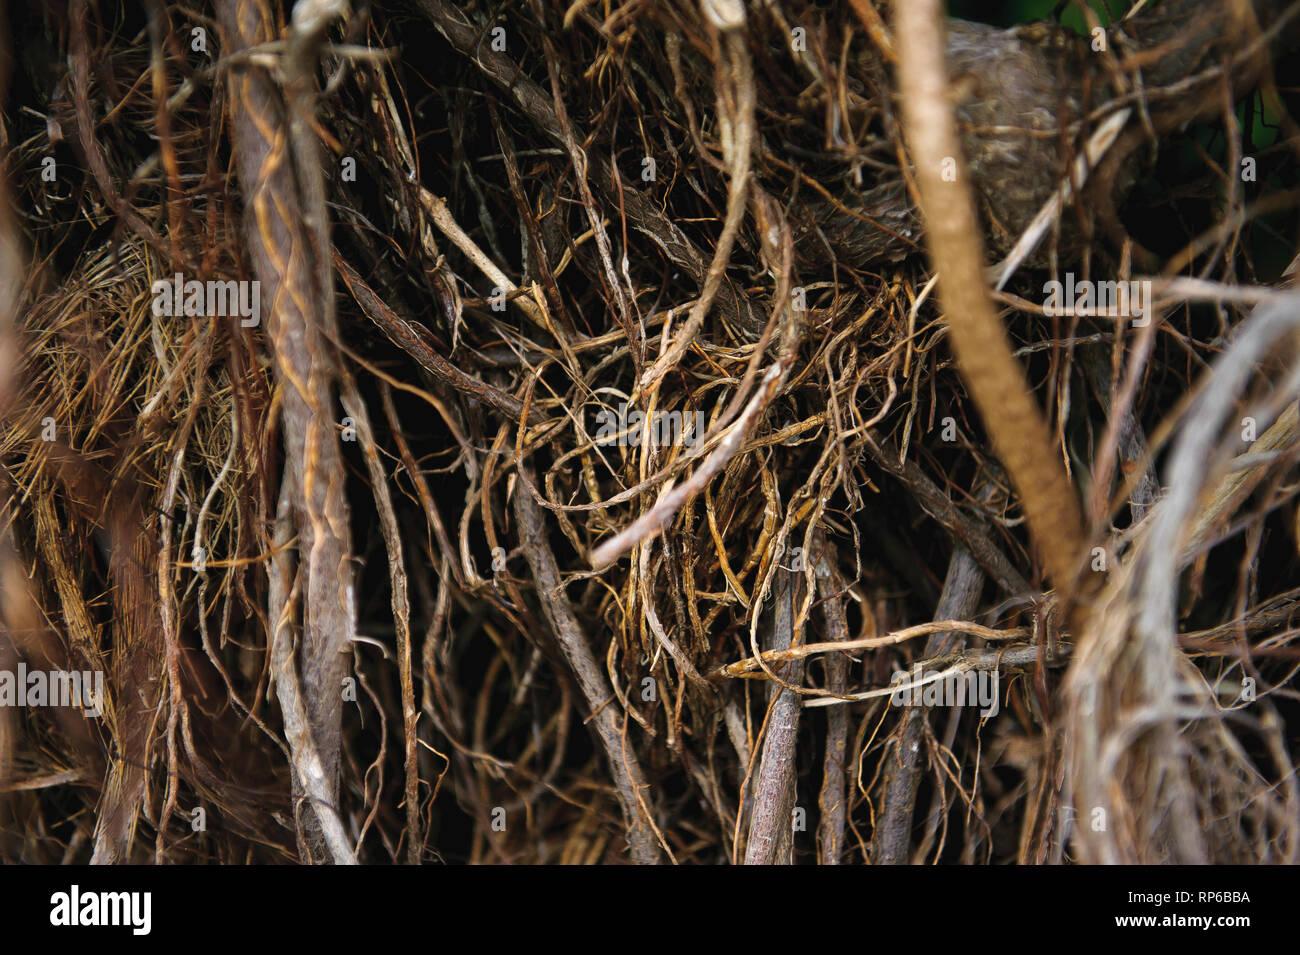 Leafless bush that looks like a bird's nest. - Stock Image